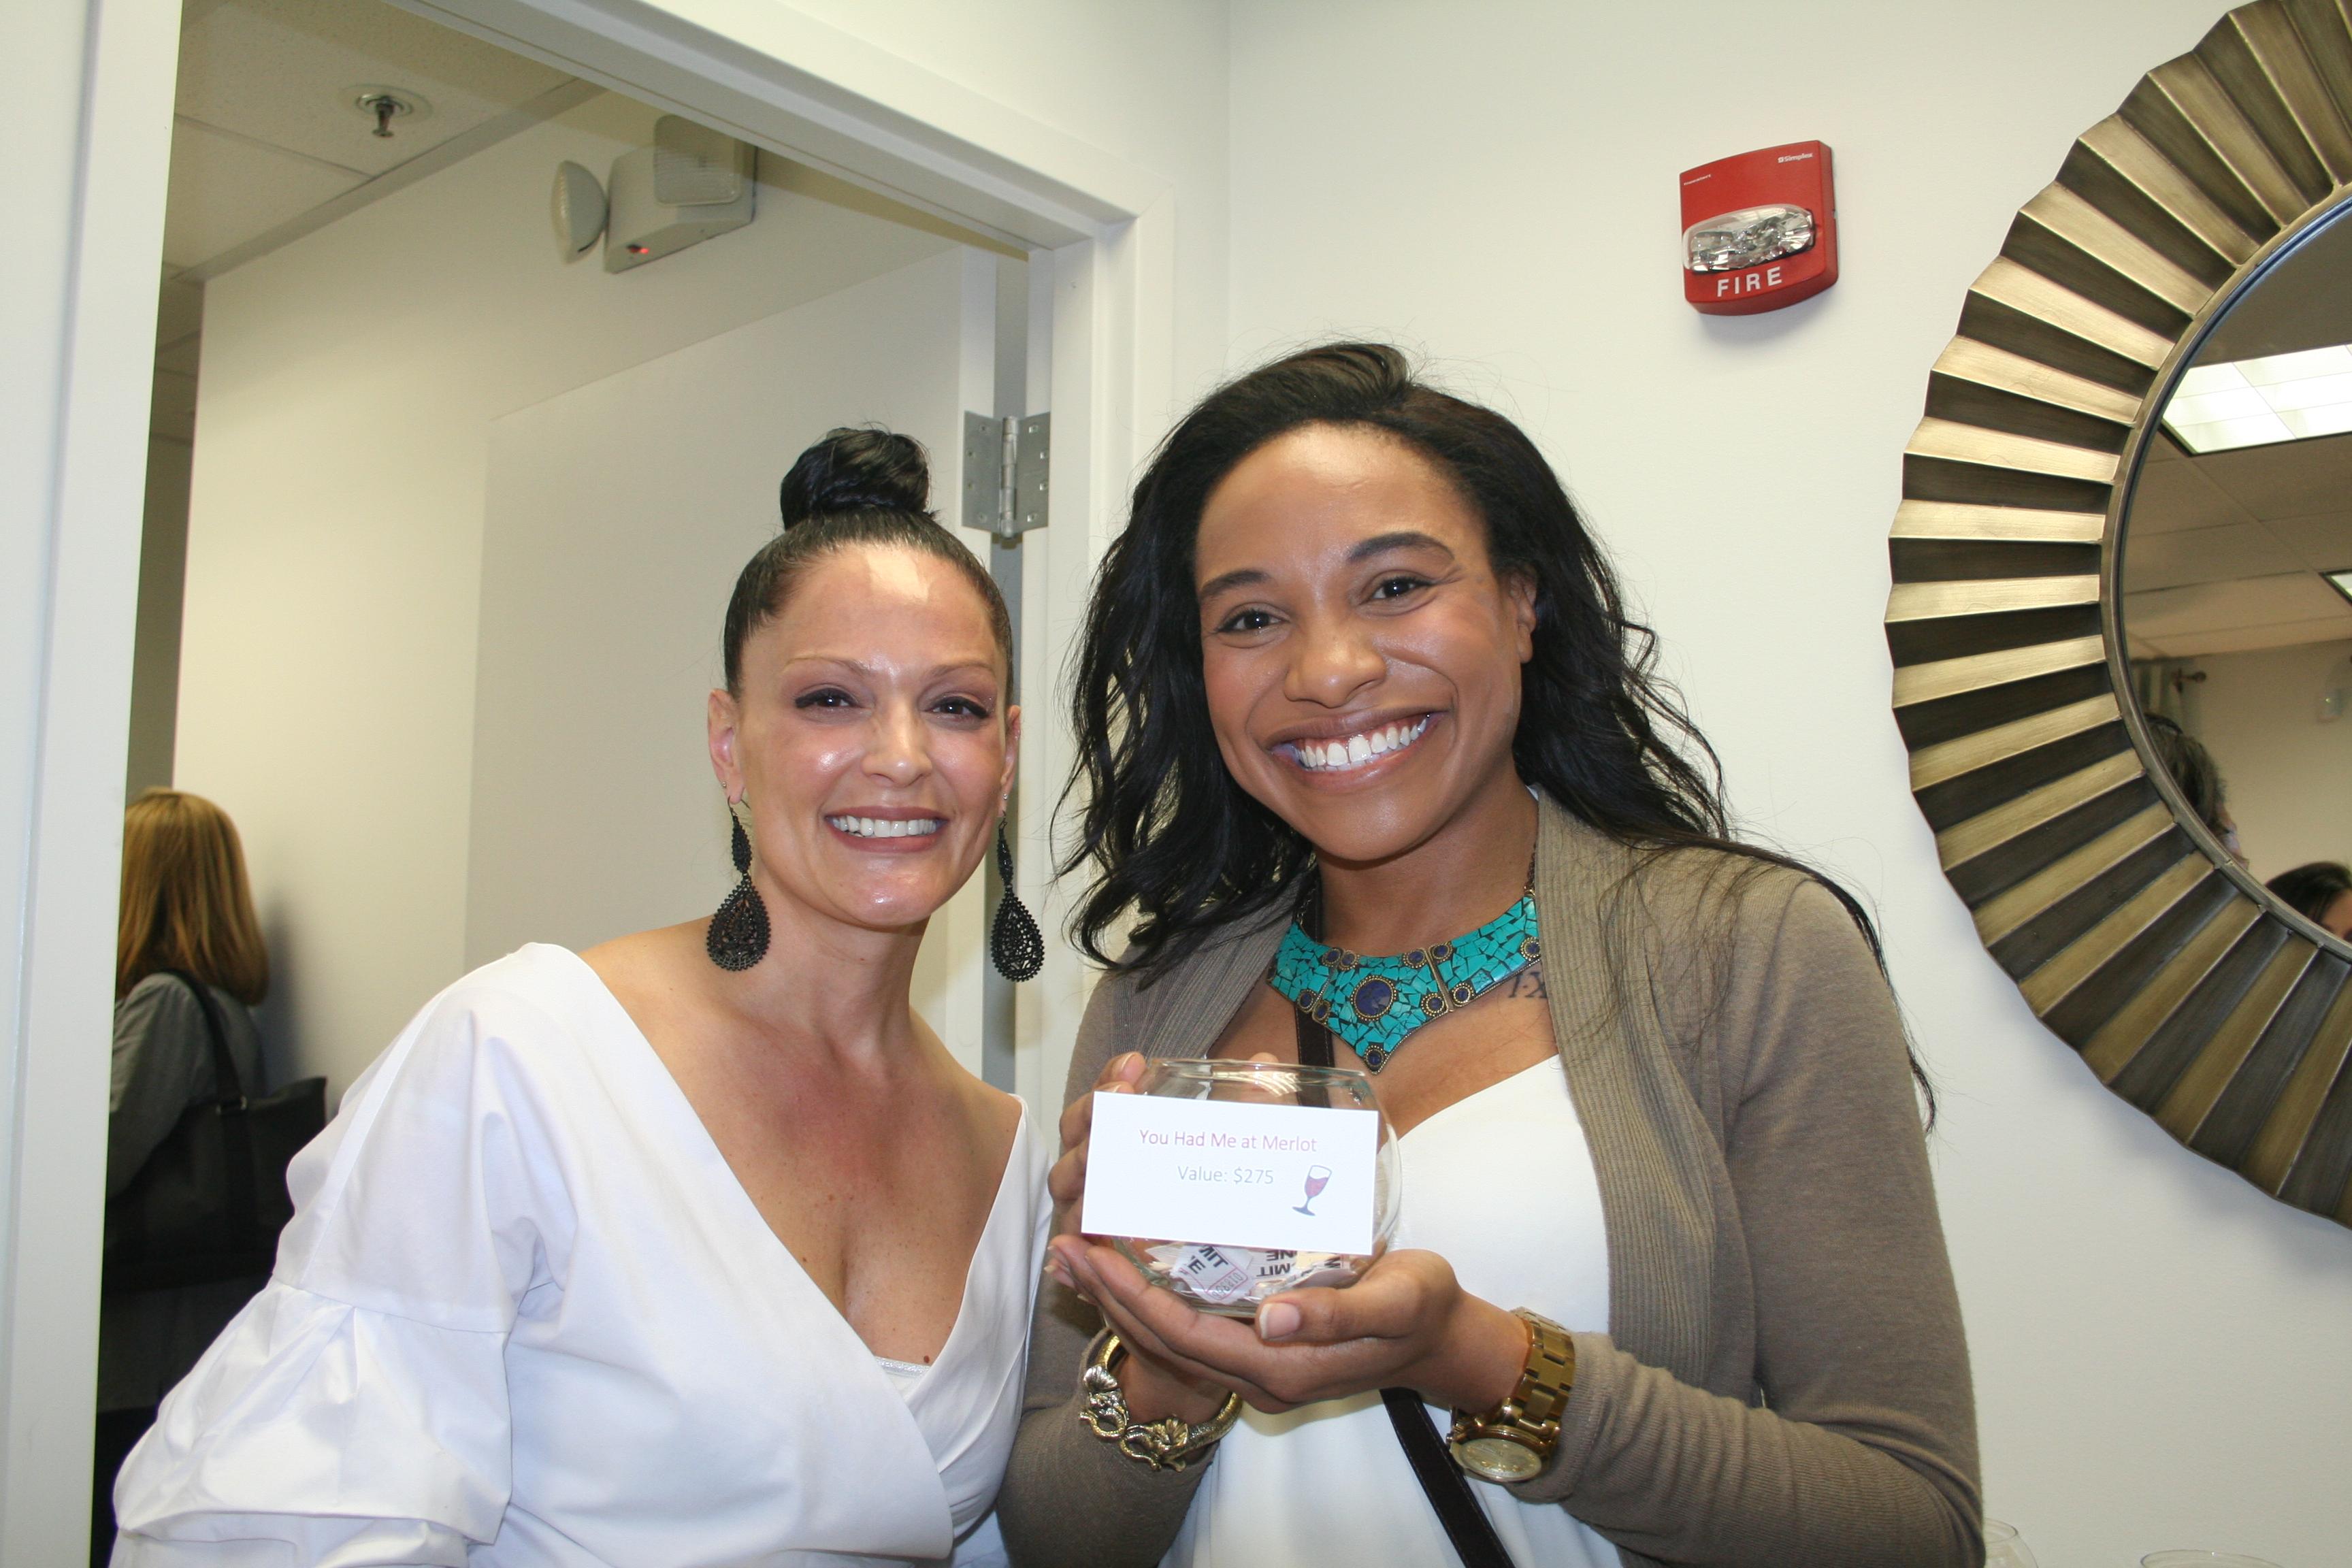 Esthetician Danielle Cios and raffle winner Yolanda Williams.